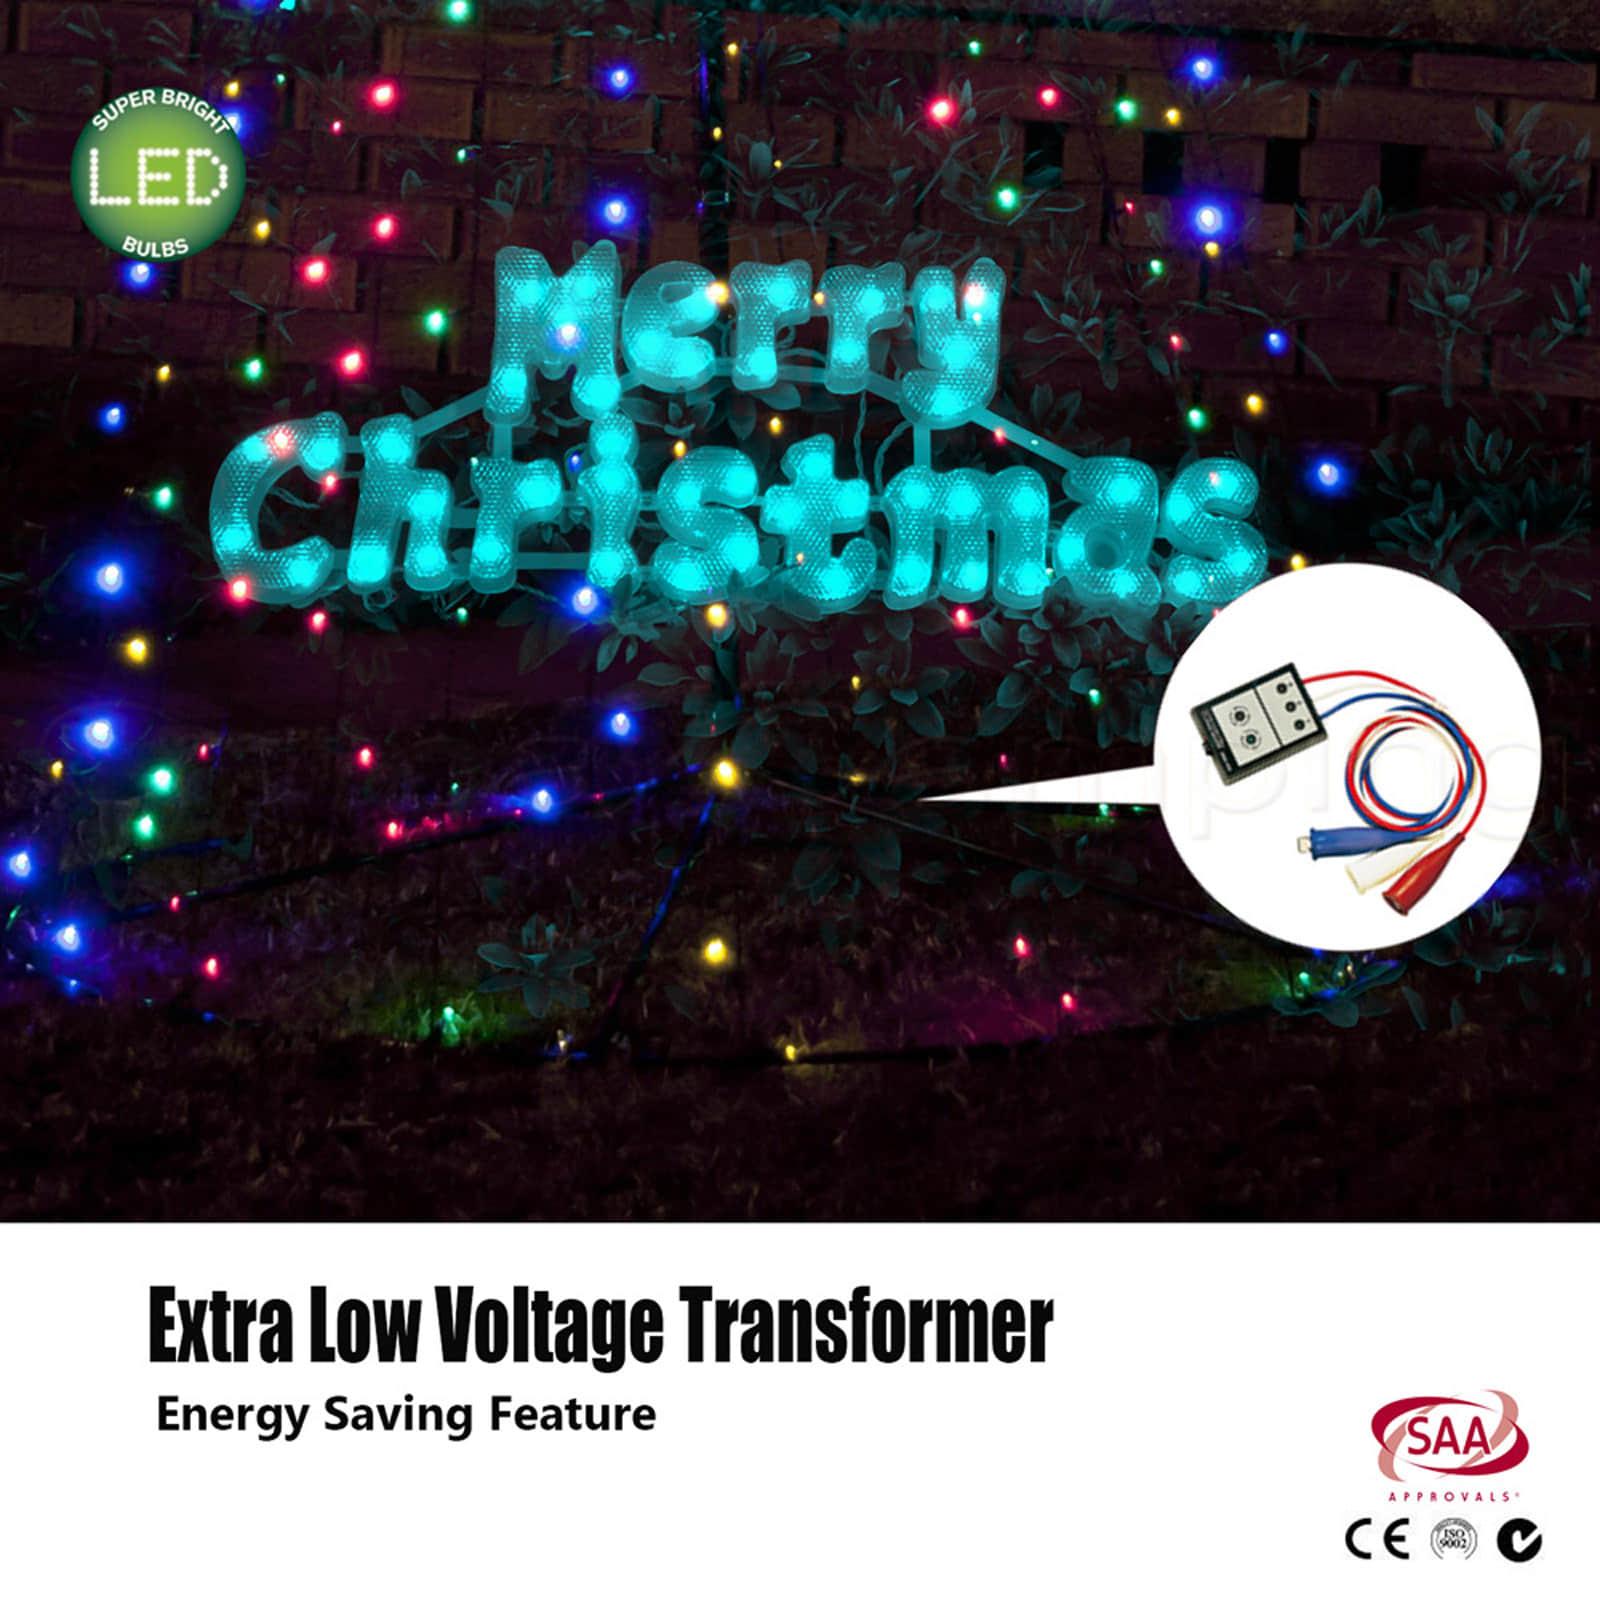 Color Changing Christmas Lights.Christmas Lights Xmas Led Light 50pc Sign Color Change Multi Flashing Modes New